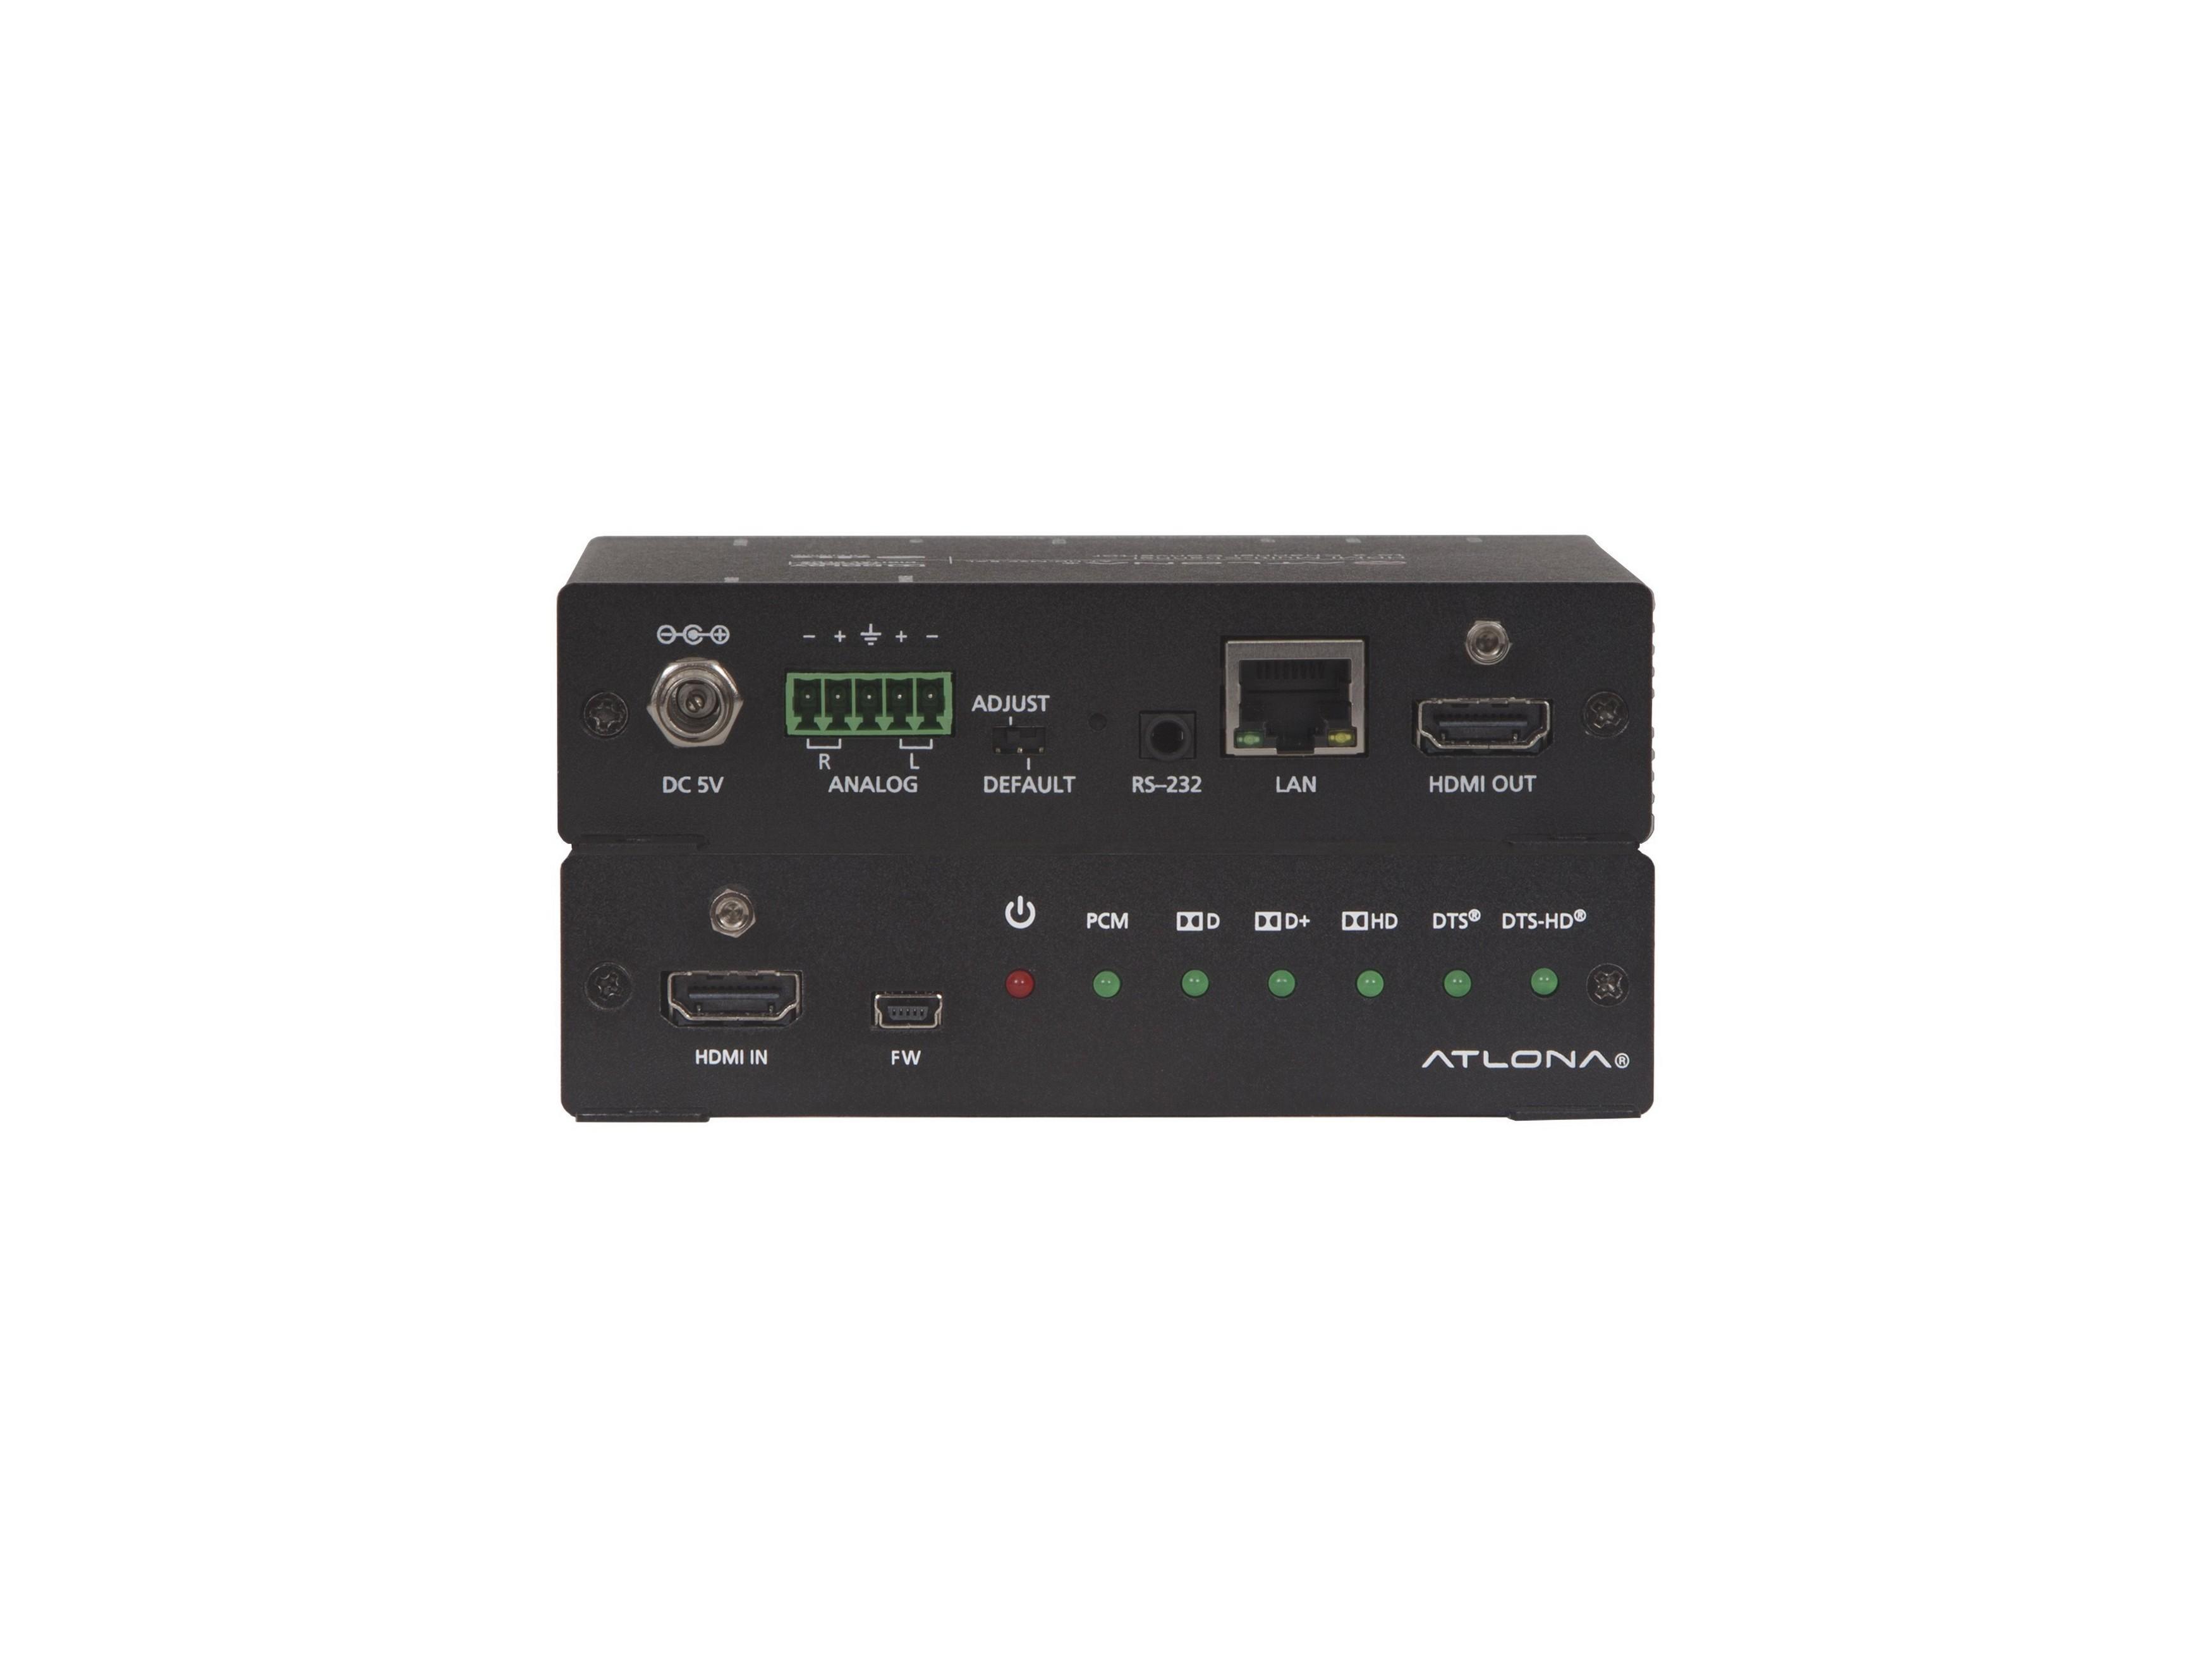 Atlona AT-UHD-M2C-BAL 4K/UHD HDMI Multi-Channel Digital to Two-Channel  Balanced Analog Audio Converter